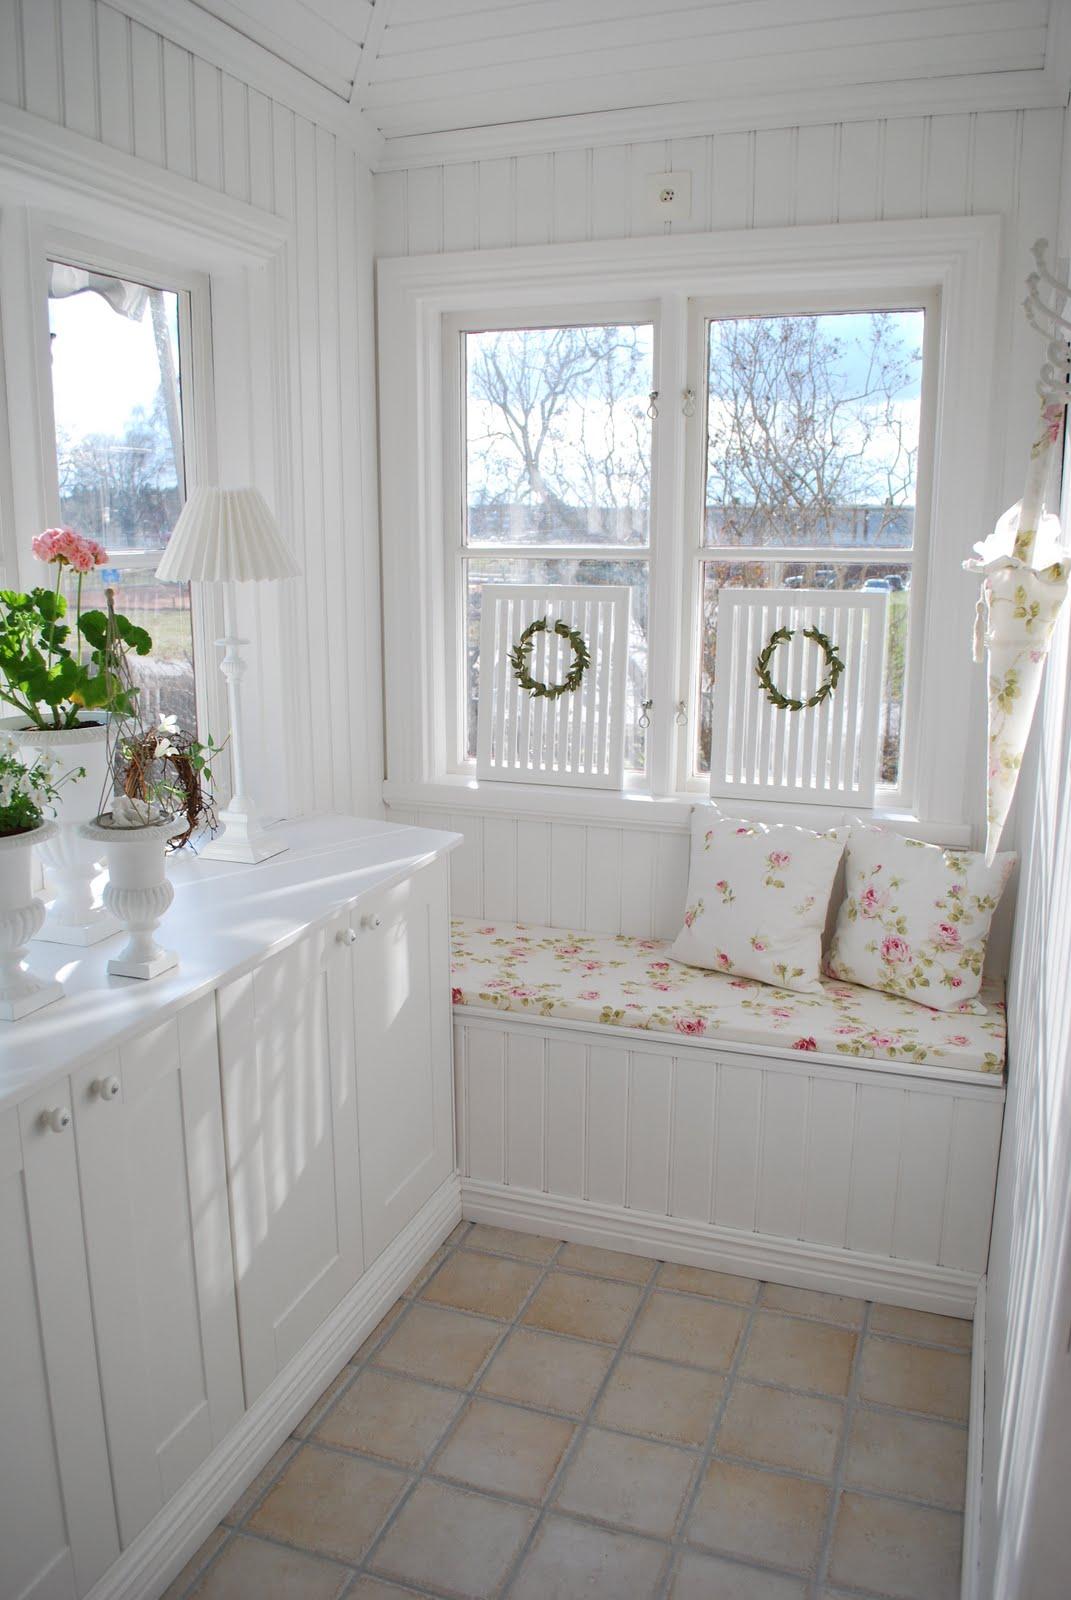 Mosaik Kok Billigt : Inreda badrum utan fonster ~ xellencom